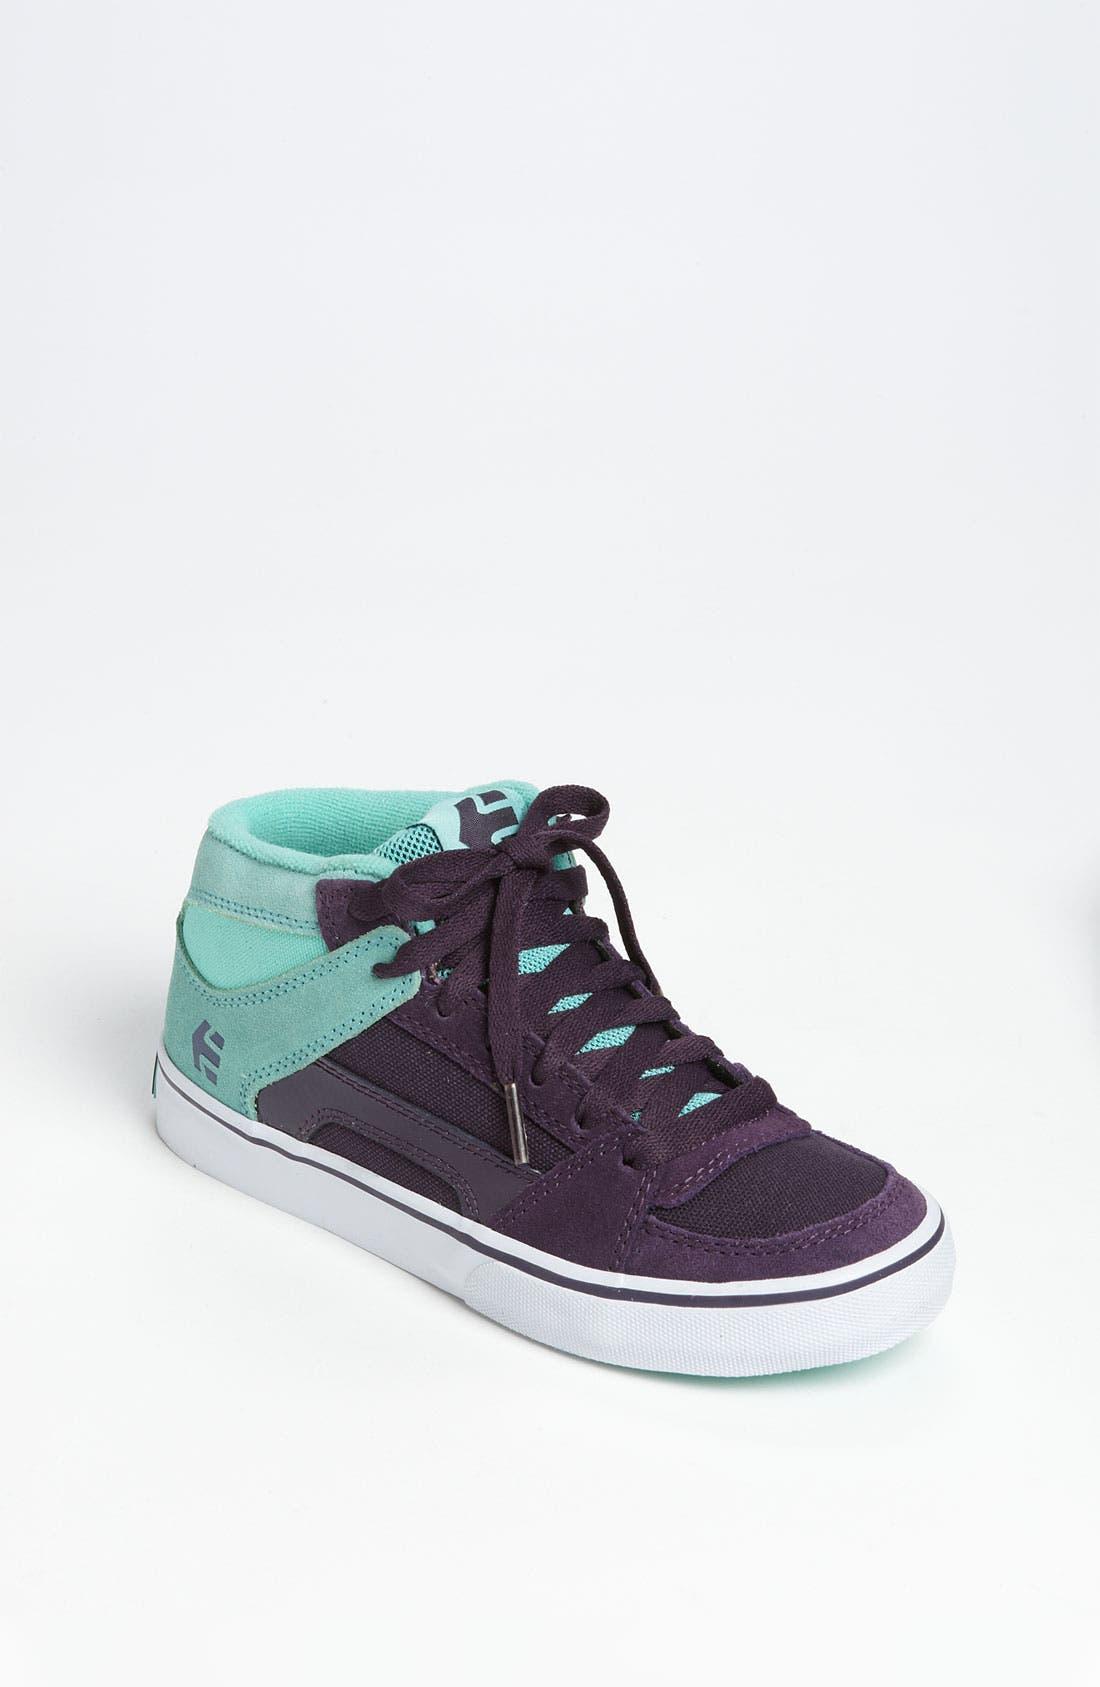 Main Image - Etnies 'RVM' Skate Shoe (Toddler, Little Kid & Big Kid)